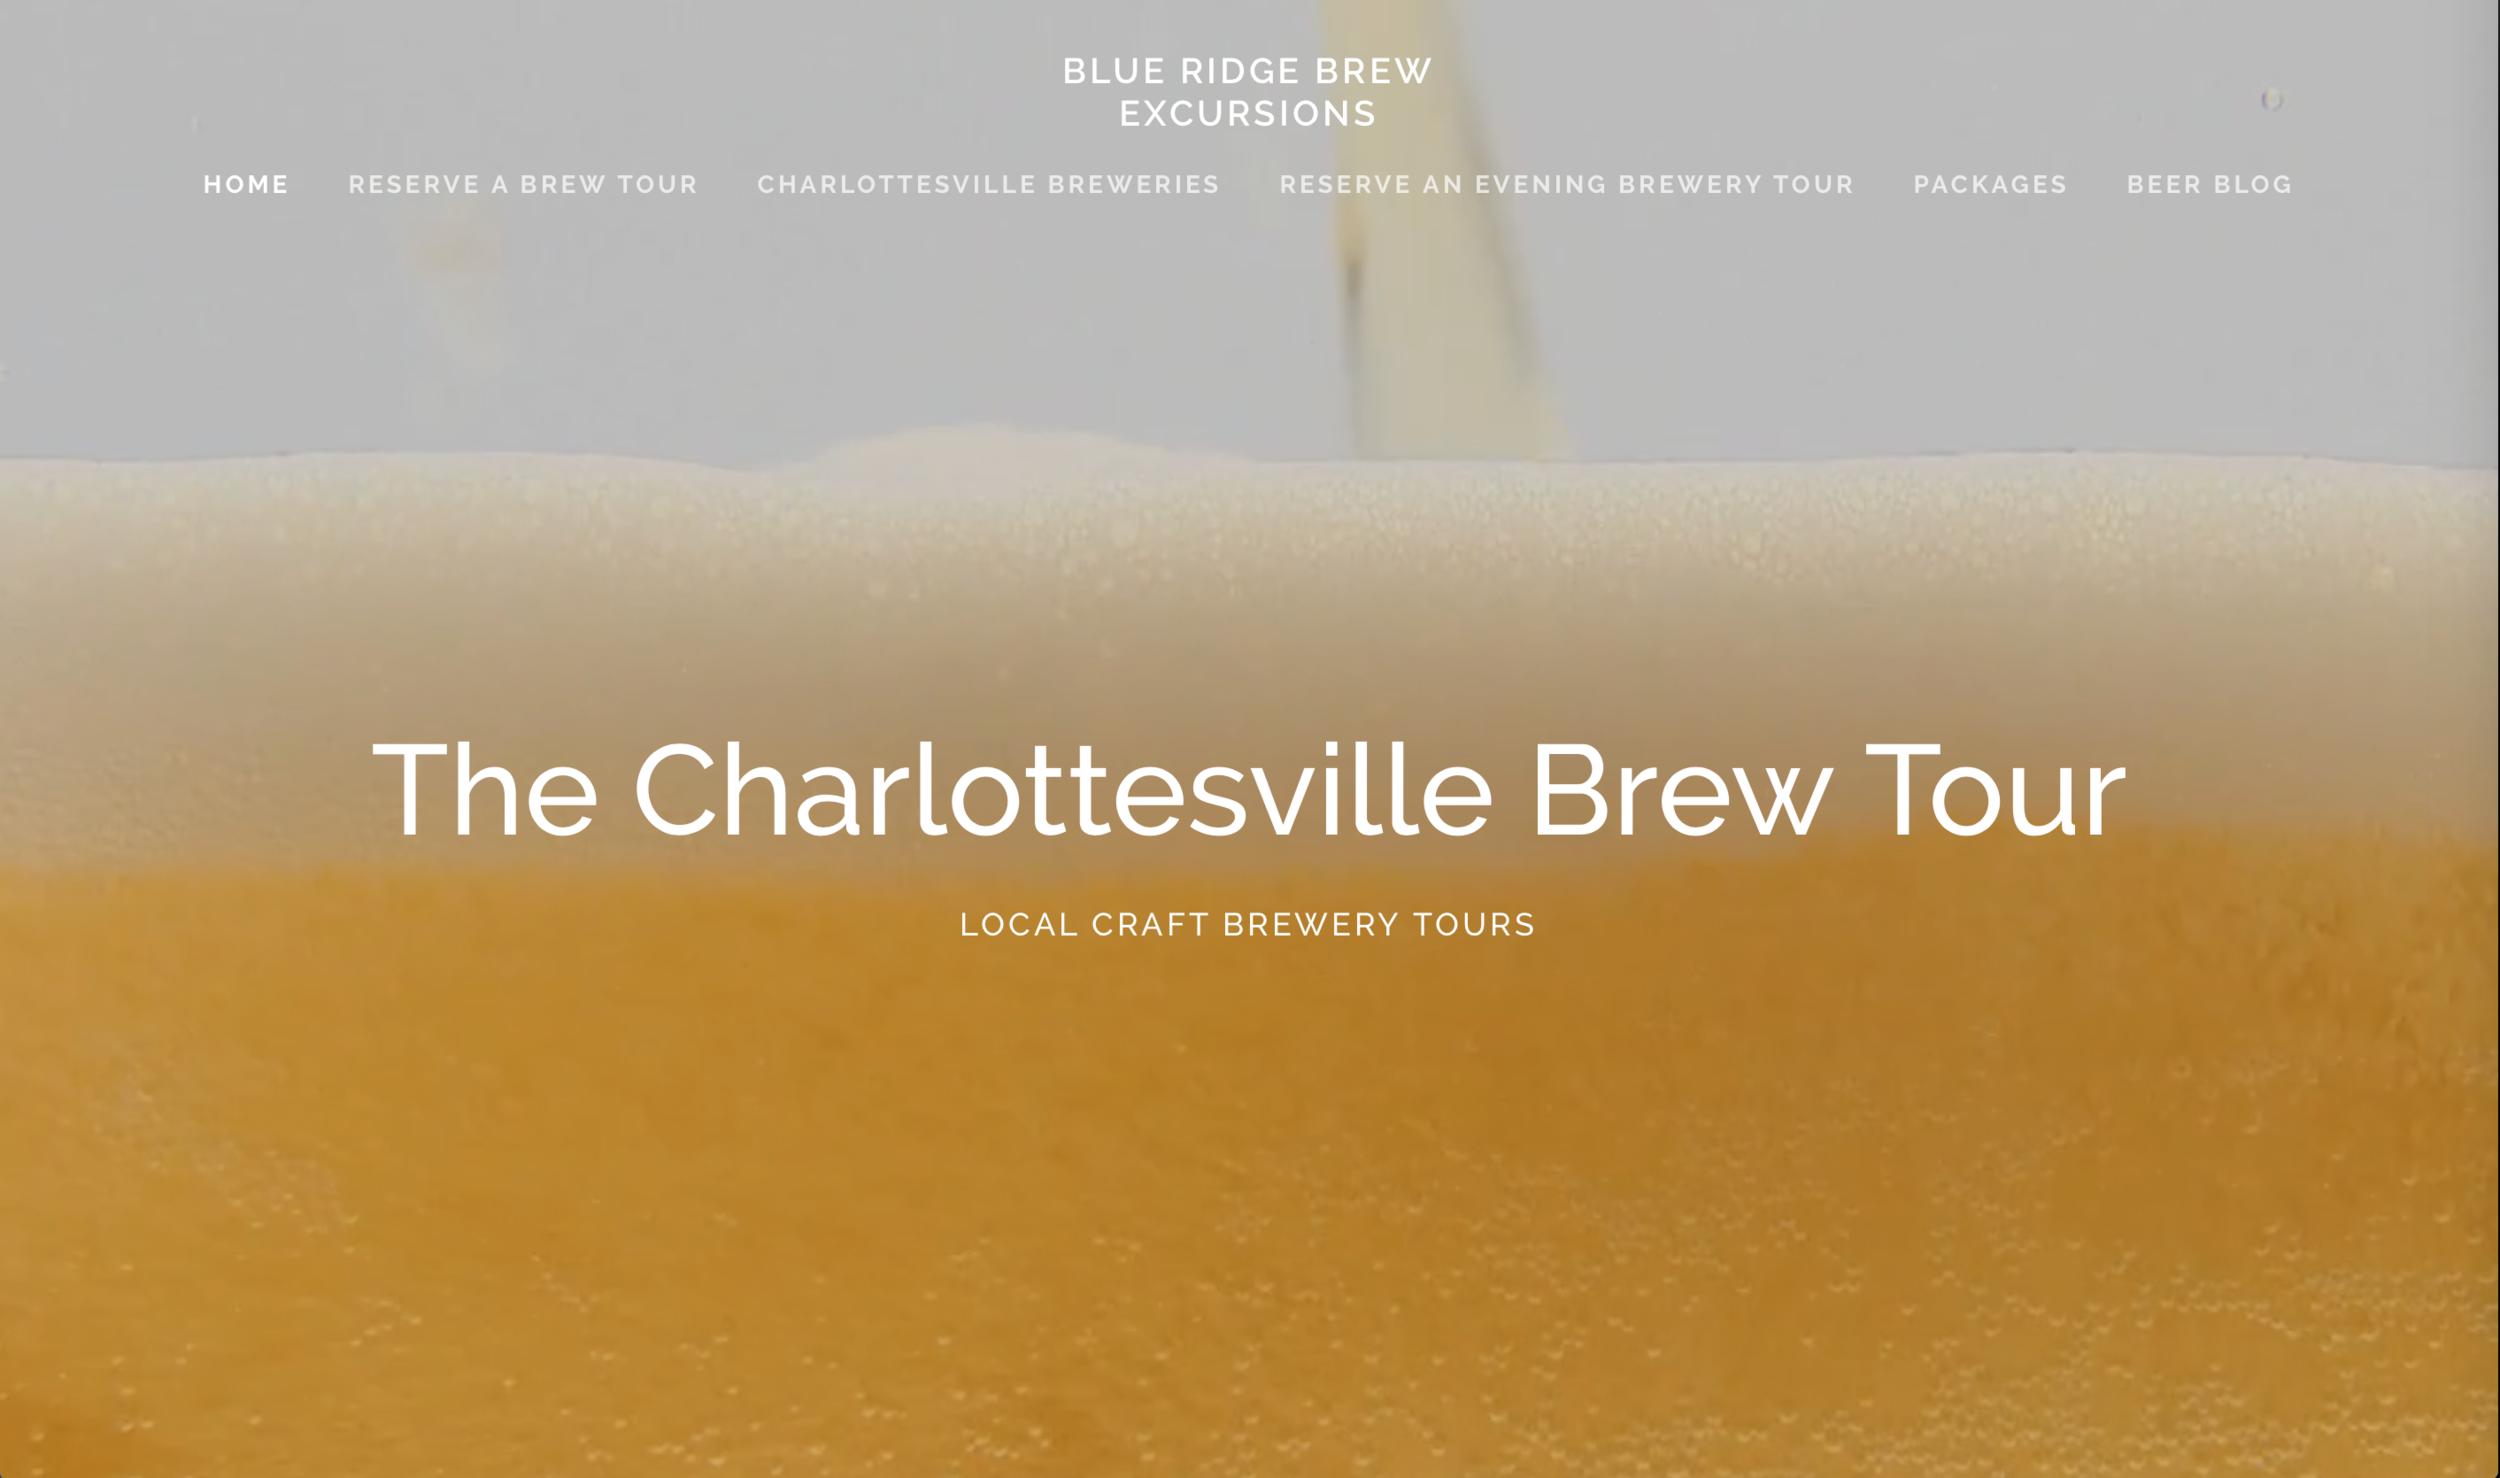 Website Design - Blue Ridge Brew Excursions